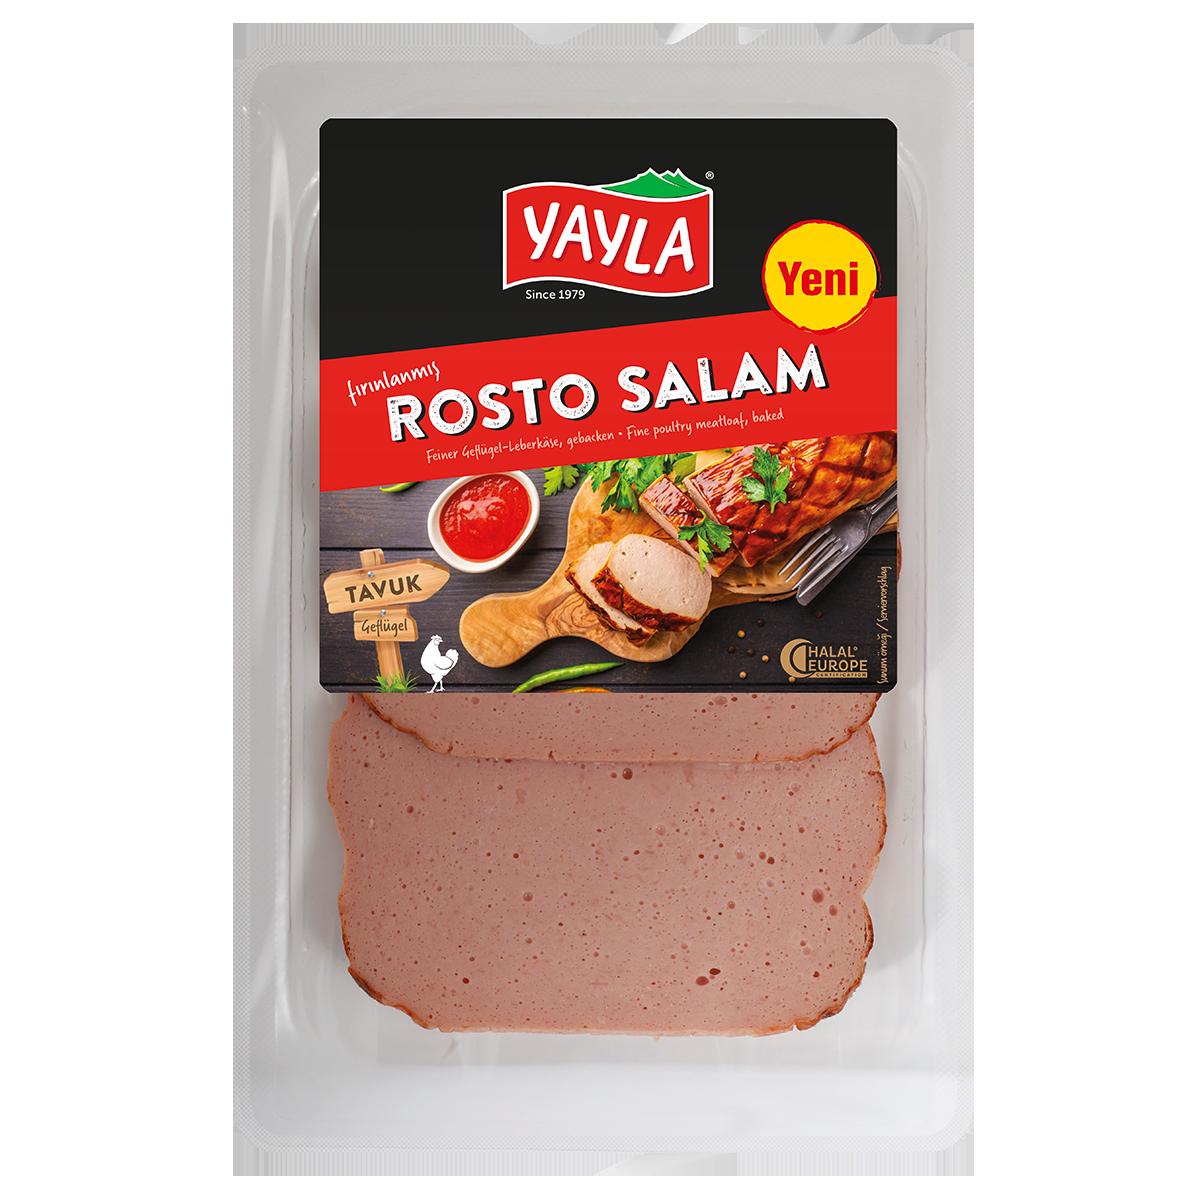 Rosto Salam